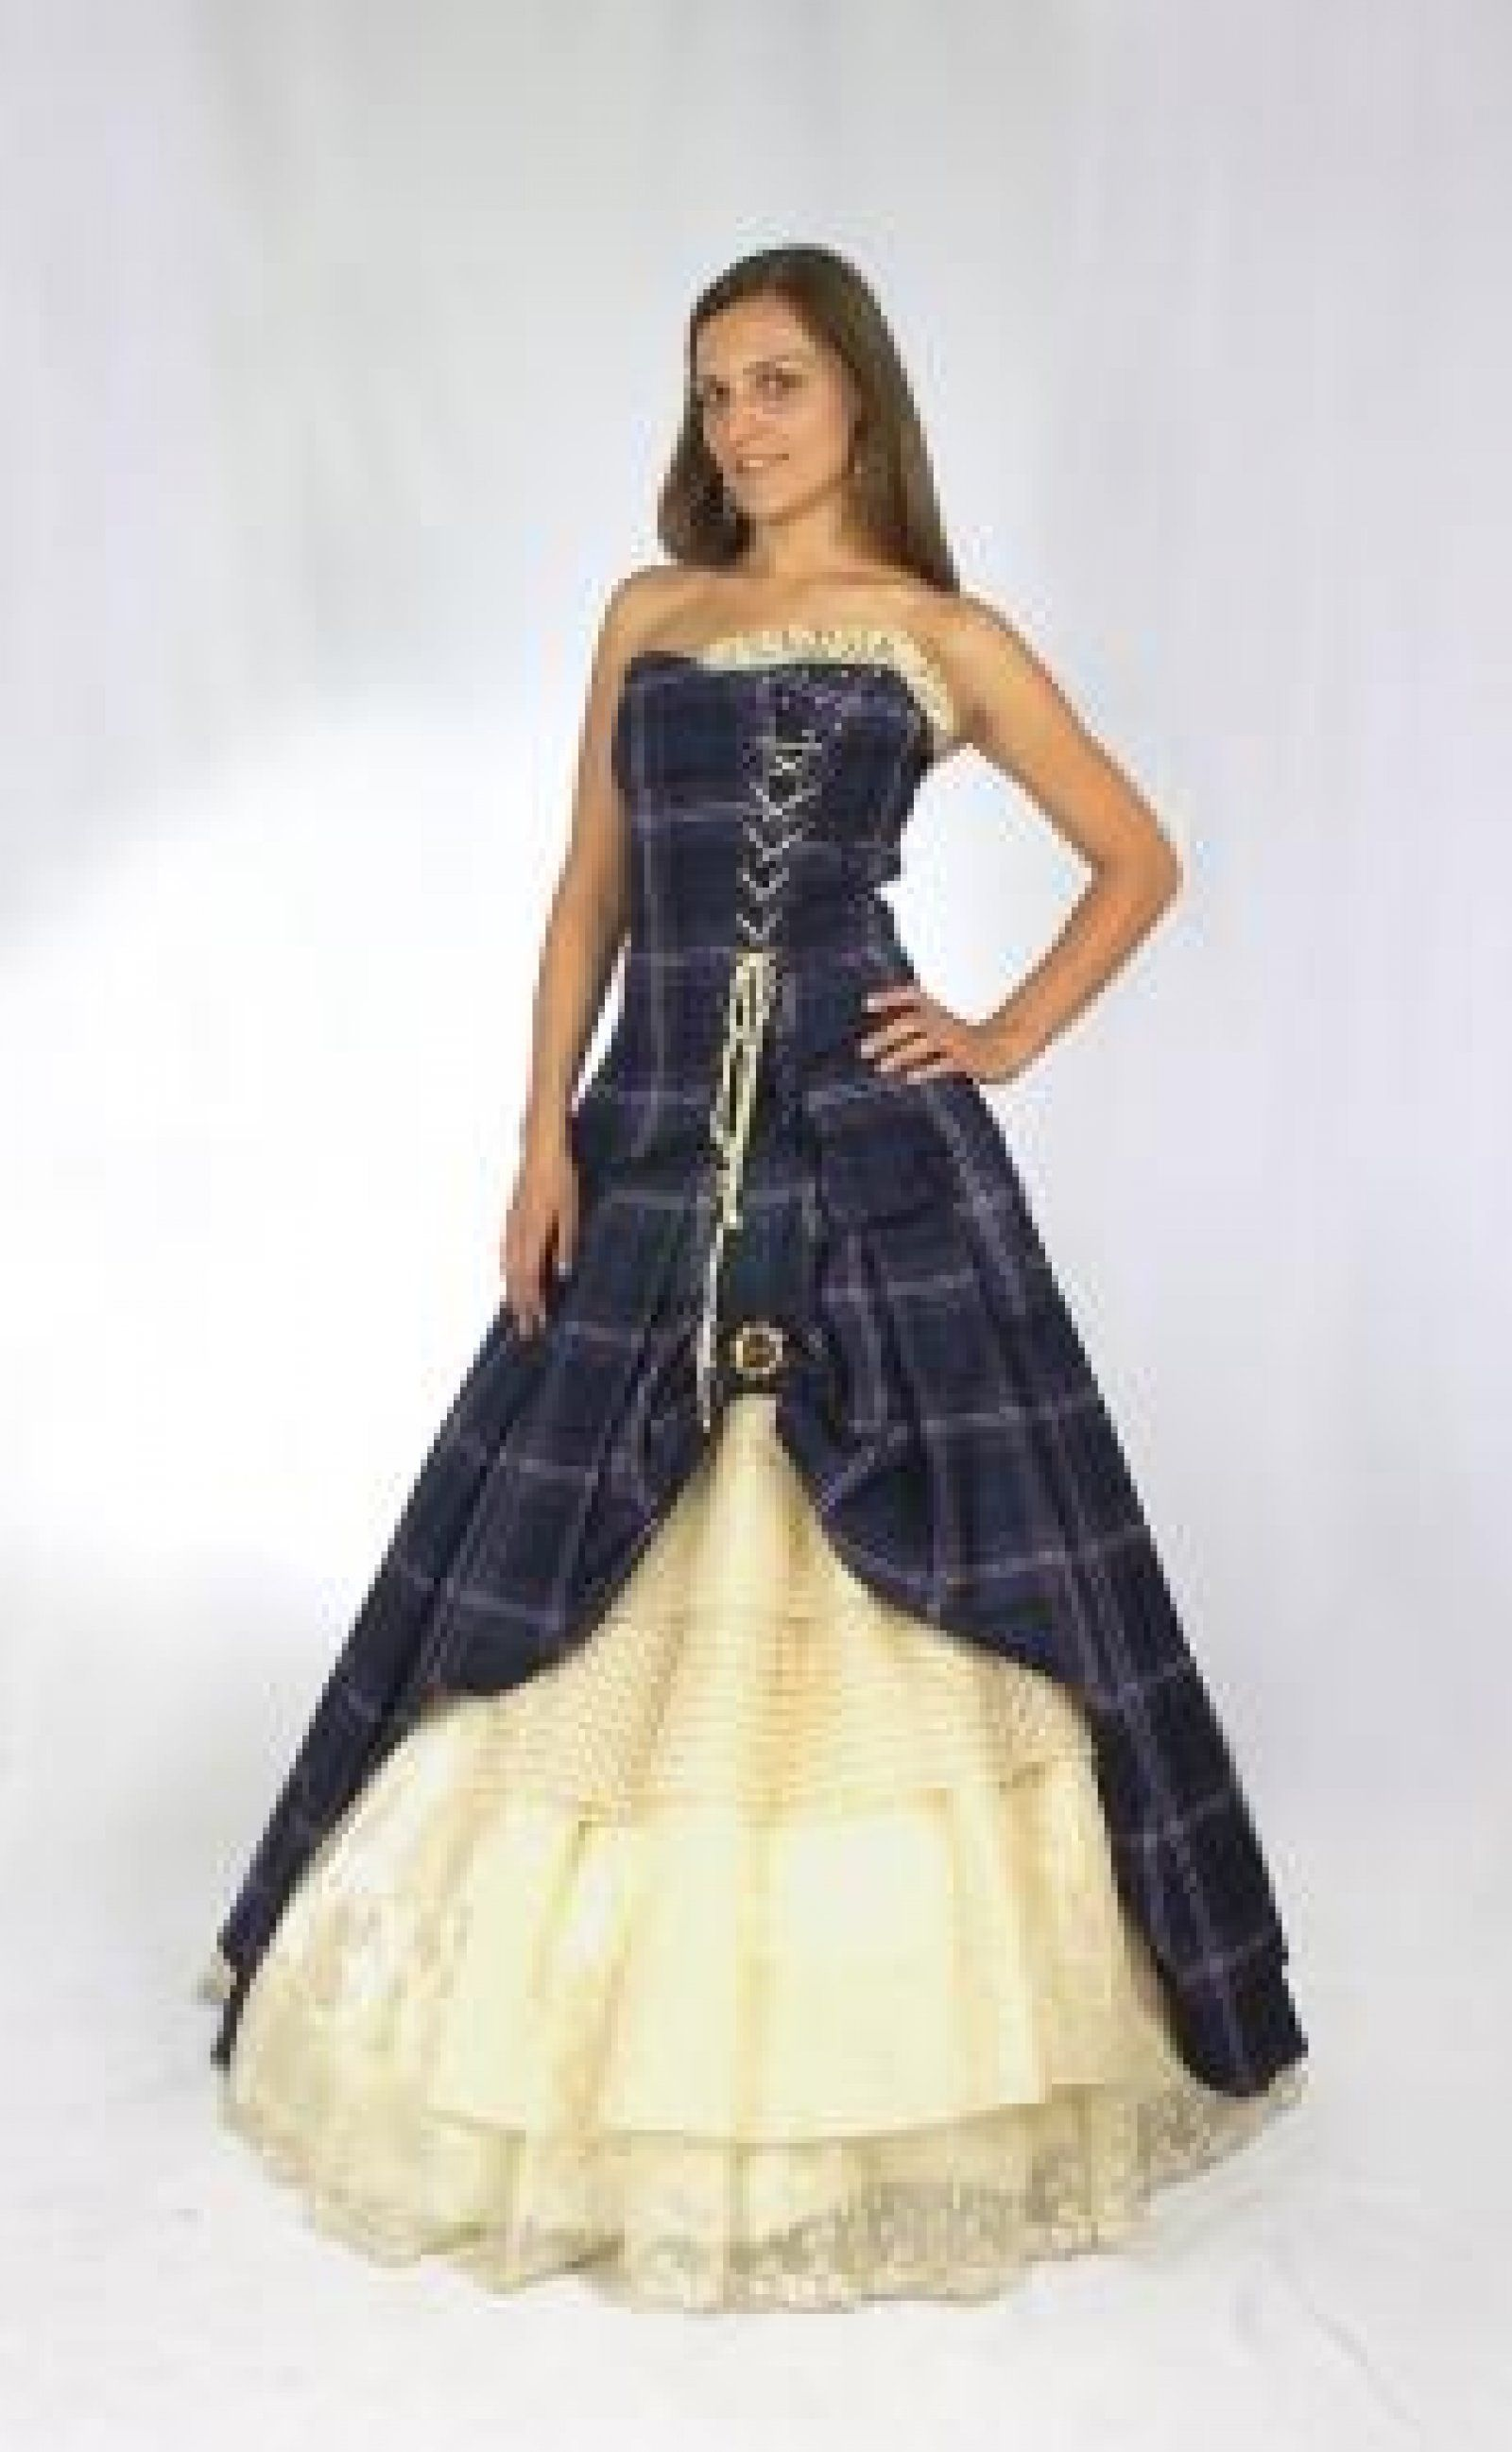 Scottish tartan wedding dress  s WEDDING GOWNS  comment on this picture the weddingvendors